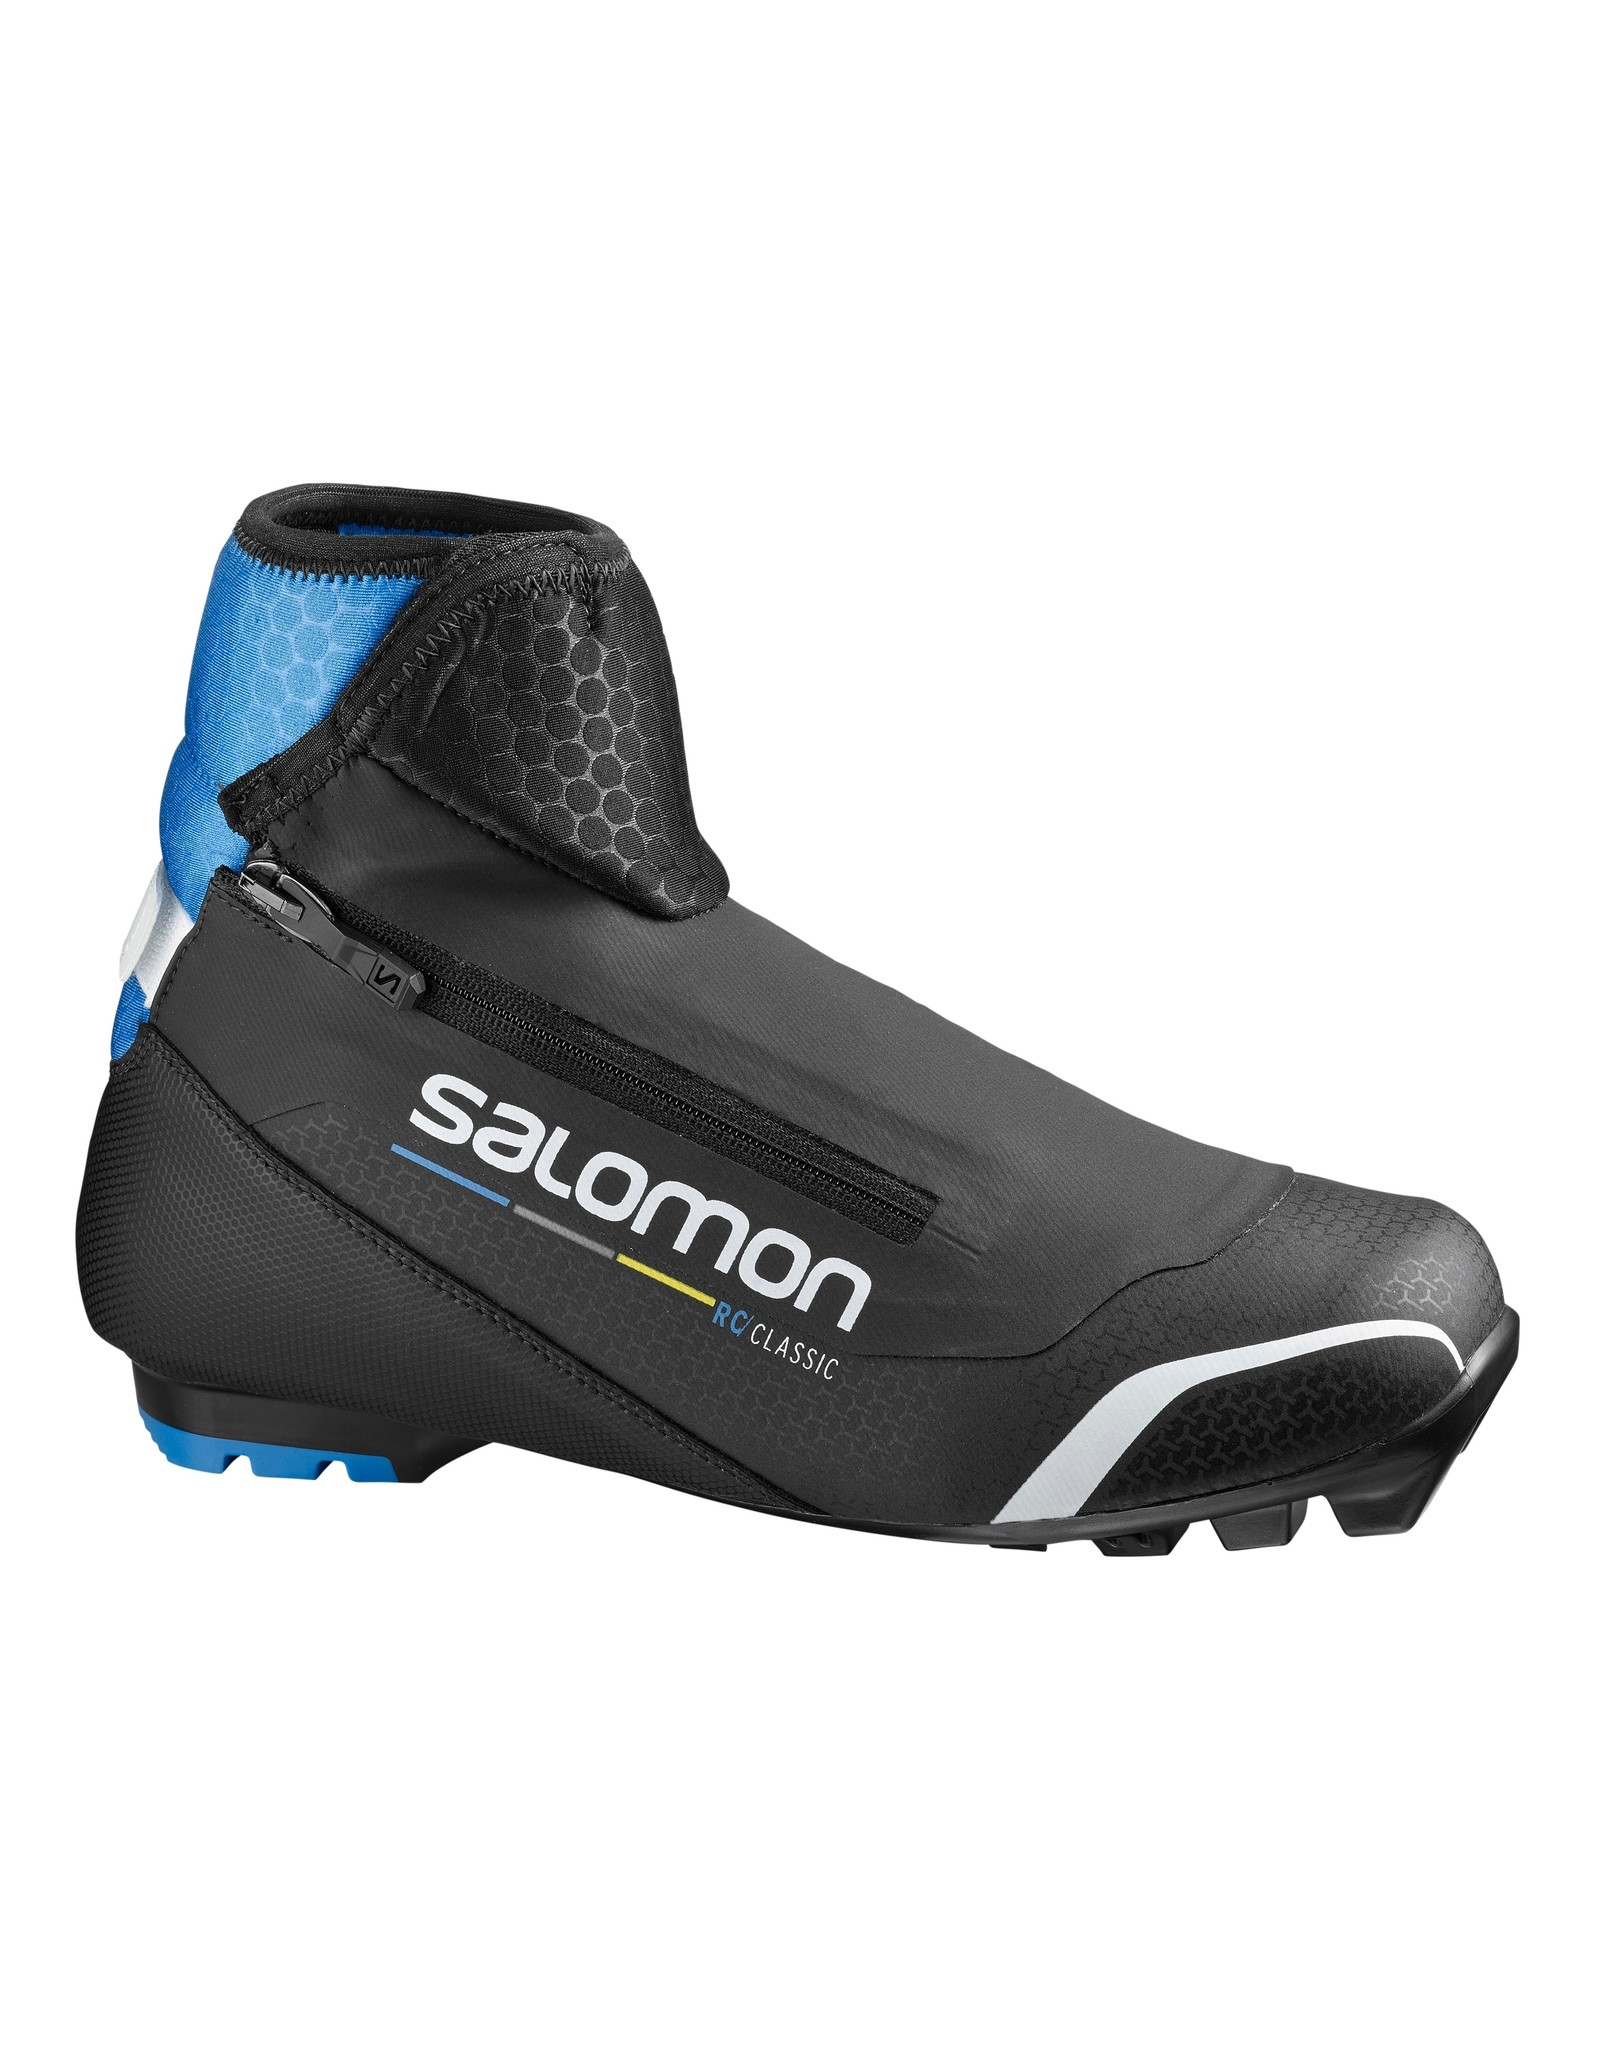 Salomon RC Pilot